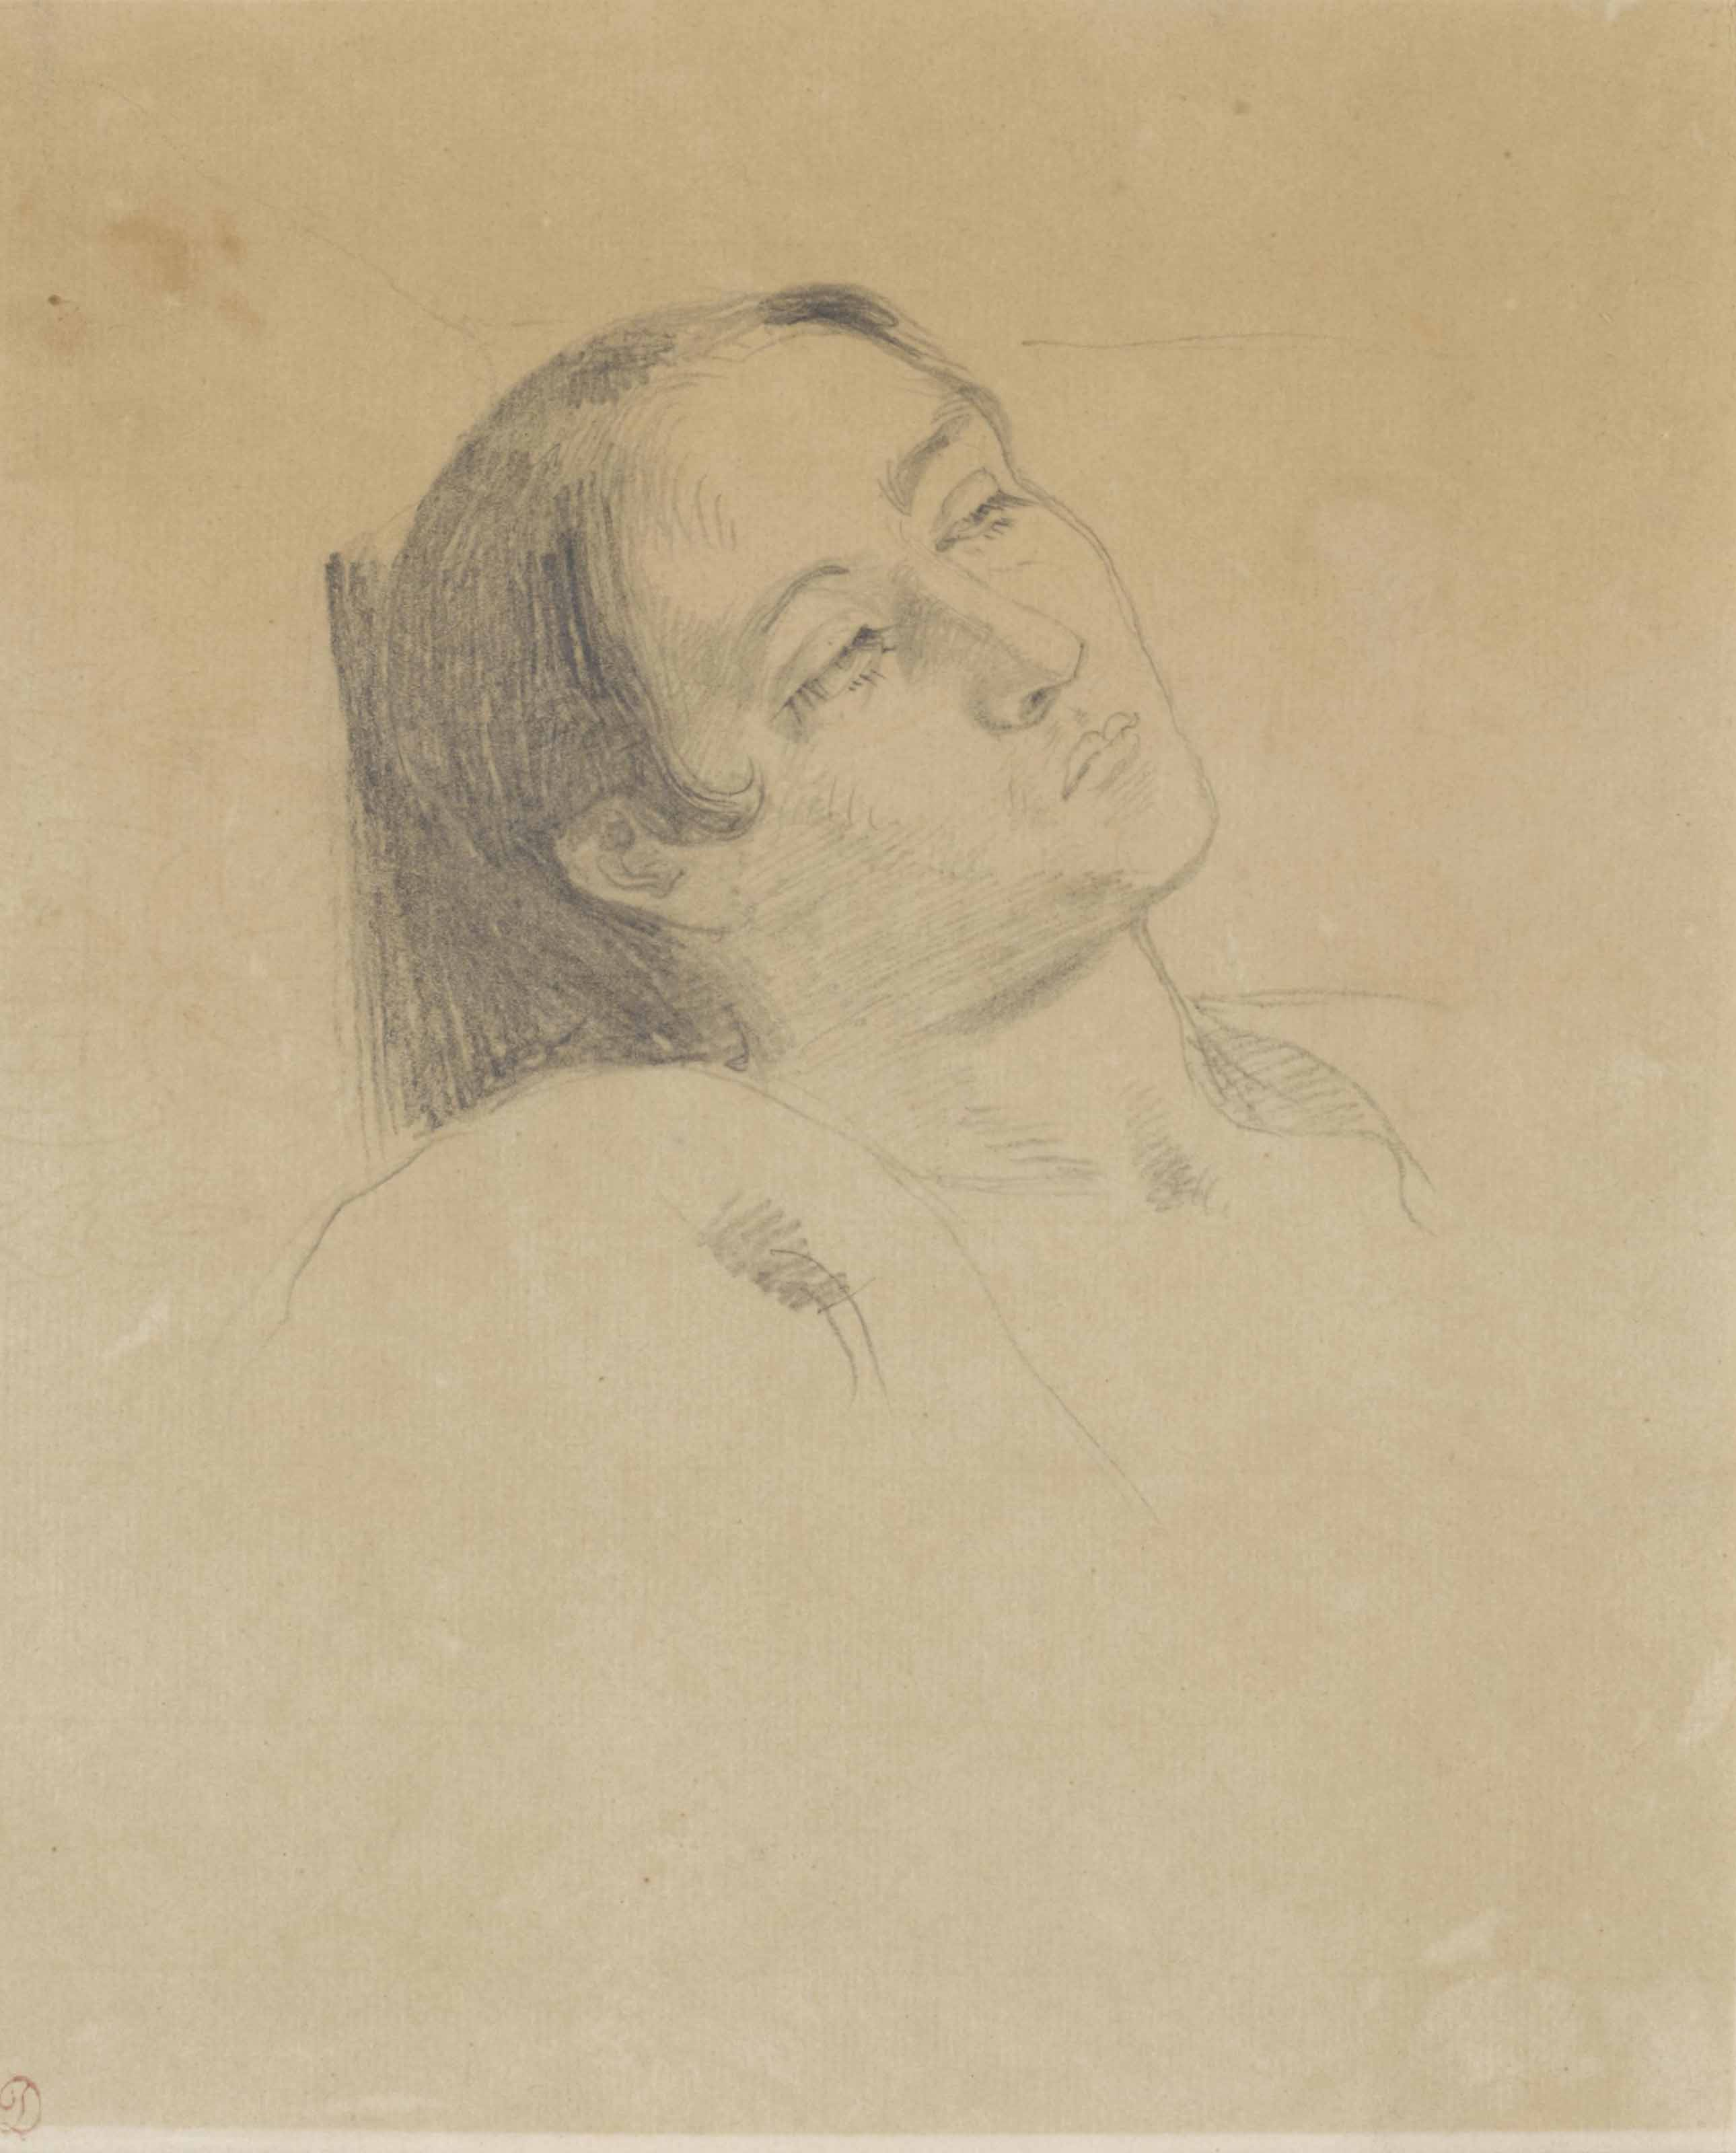 Ferdinand-Victor-Eugène DELACROIX (Charenton-Saint-Maurice 1798-1863 Paris)